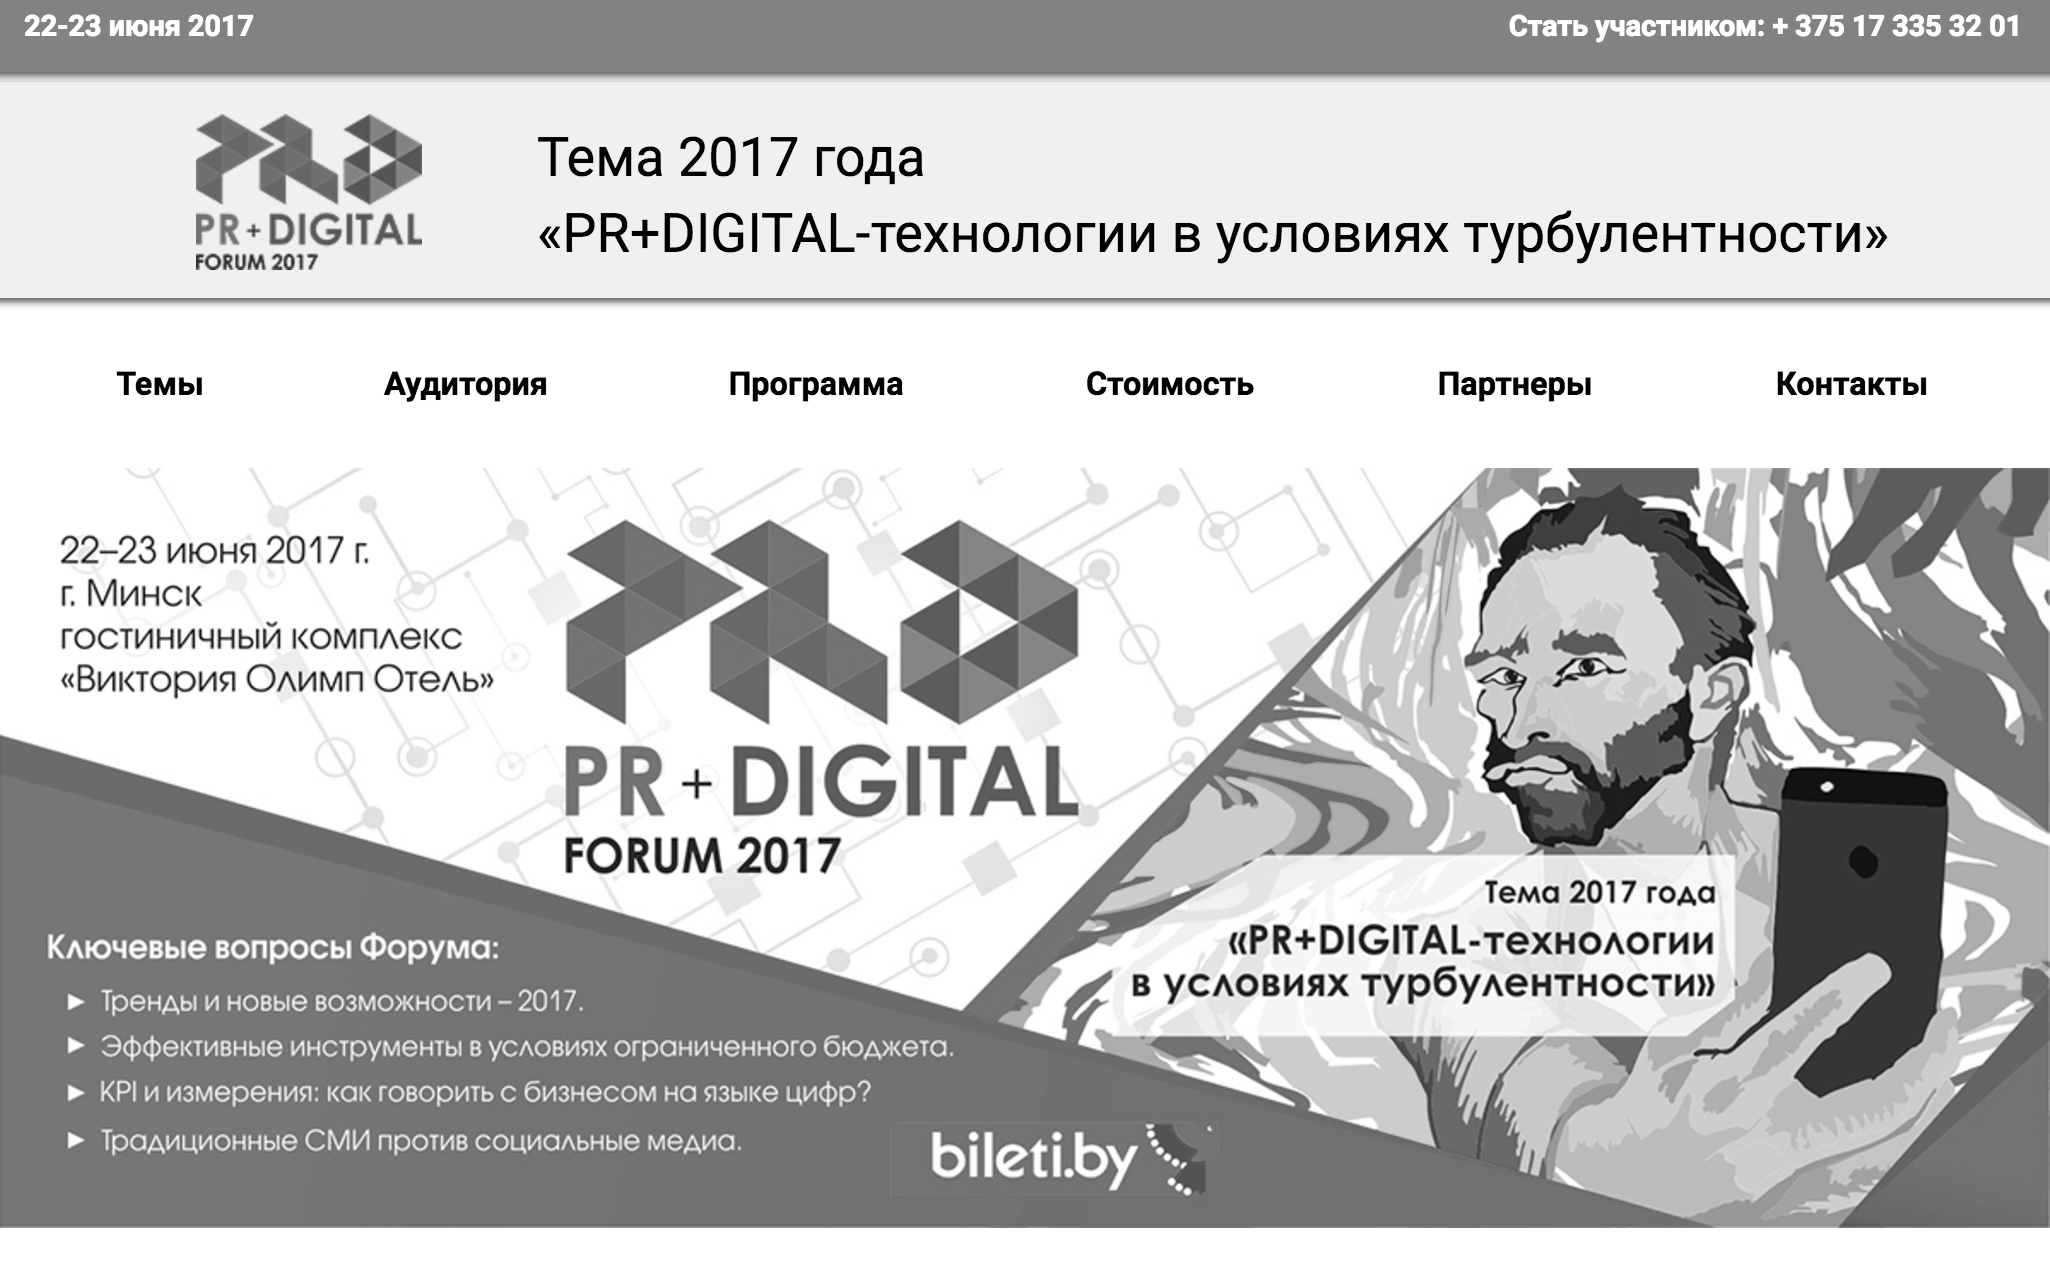 «PR + digital-технологии в условия турбулентности»